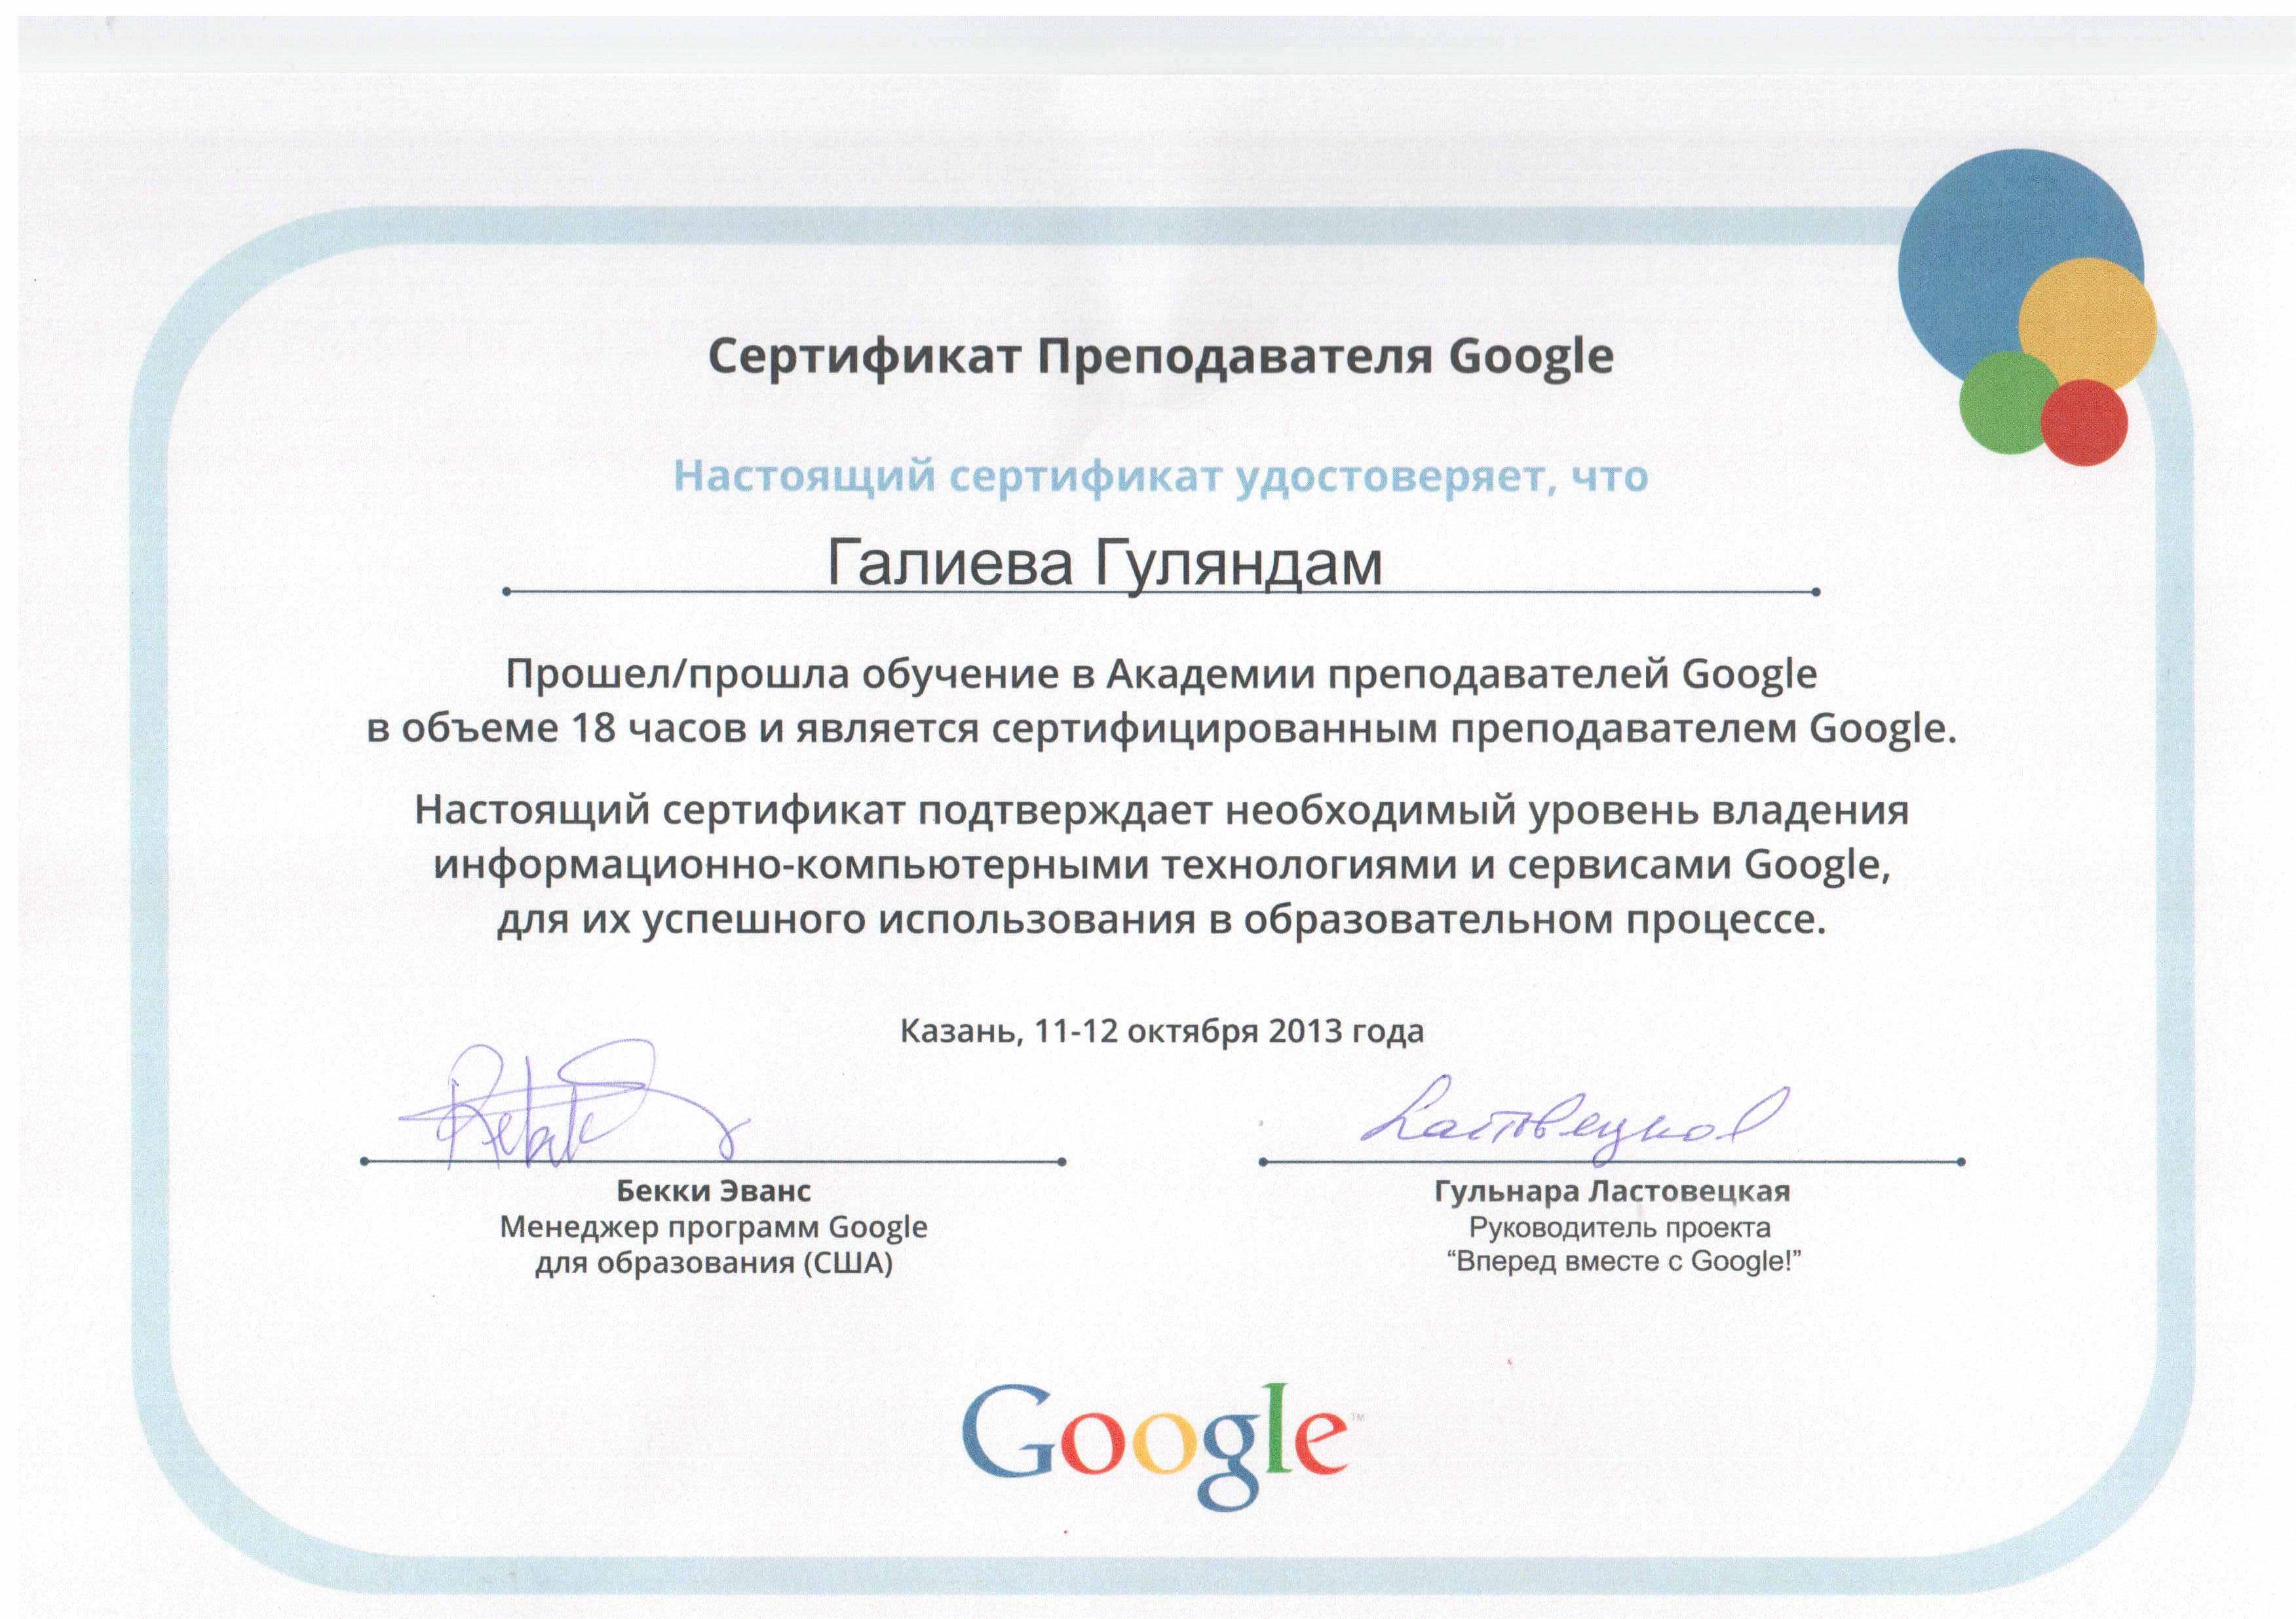 C:\Users\Компьютер\AppData\Local\Microsoft\Windows\Temporary Internet Files\Content.Word\сертификат гугл.jpg